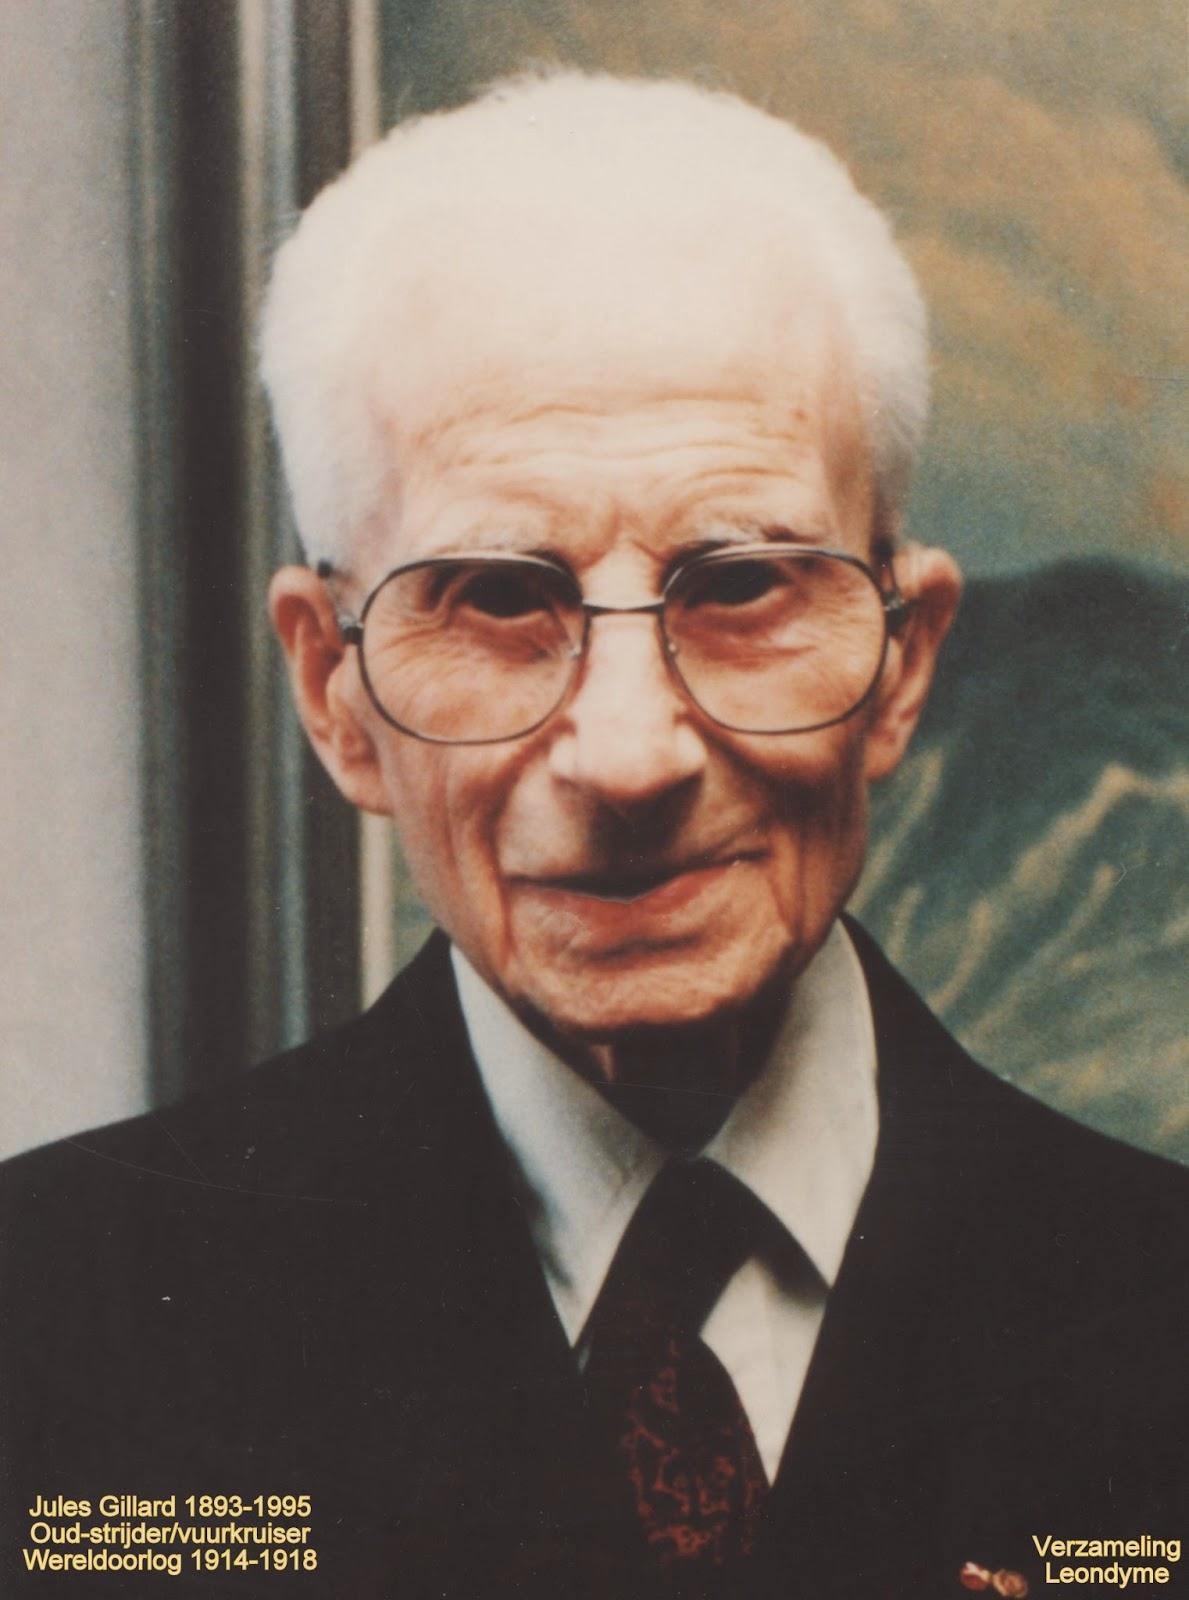 Oud-strijder en vuurkruiser Juels Gillard 1893-1995. Verzameling Leondyme